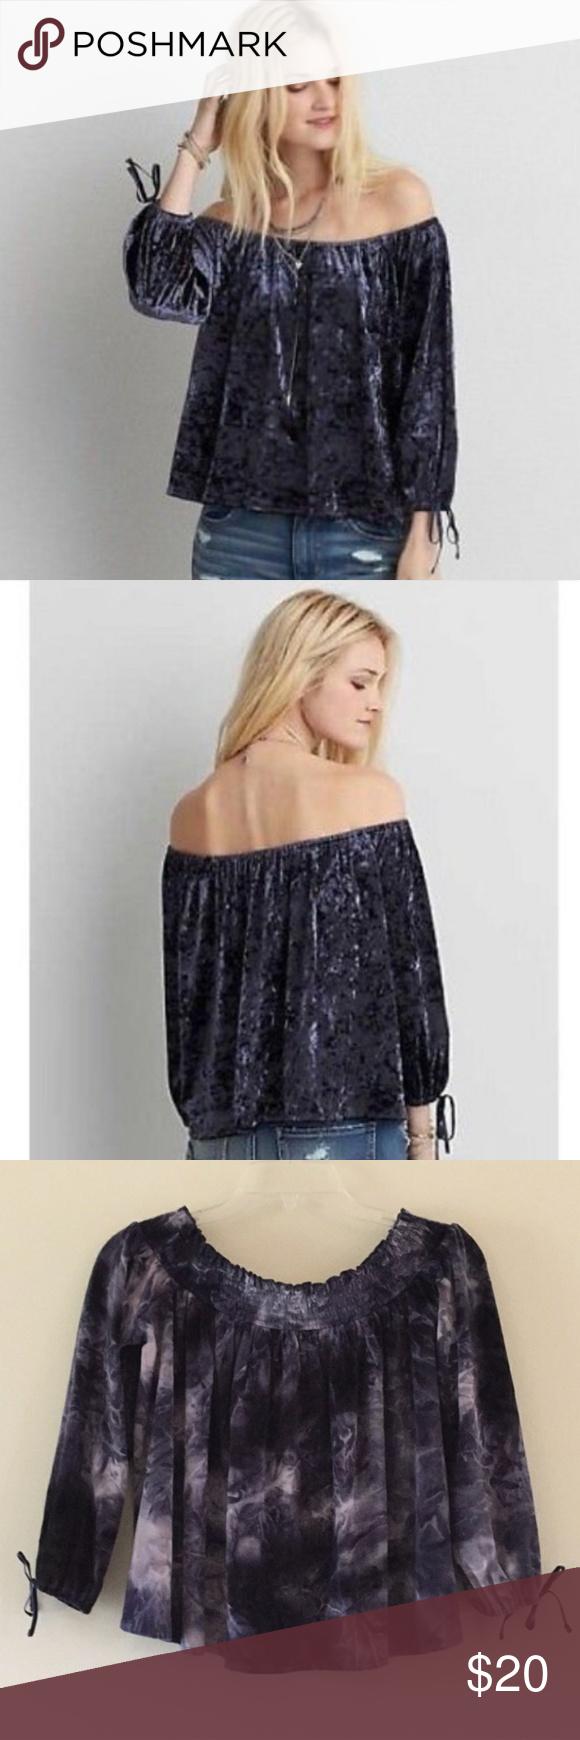 7f6b91beea2a39 NWT American Eagle Crushed Velvet Flirt Shirt - Gorgeous tye-dye Mystic  Blue color -